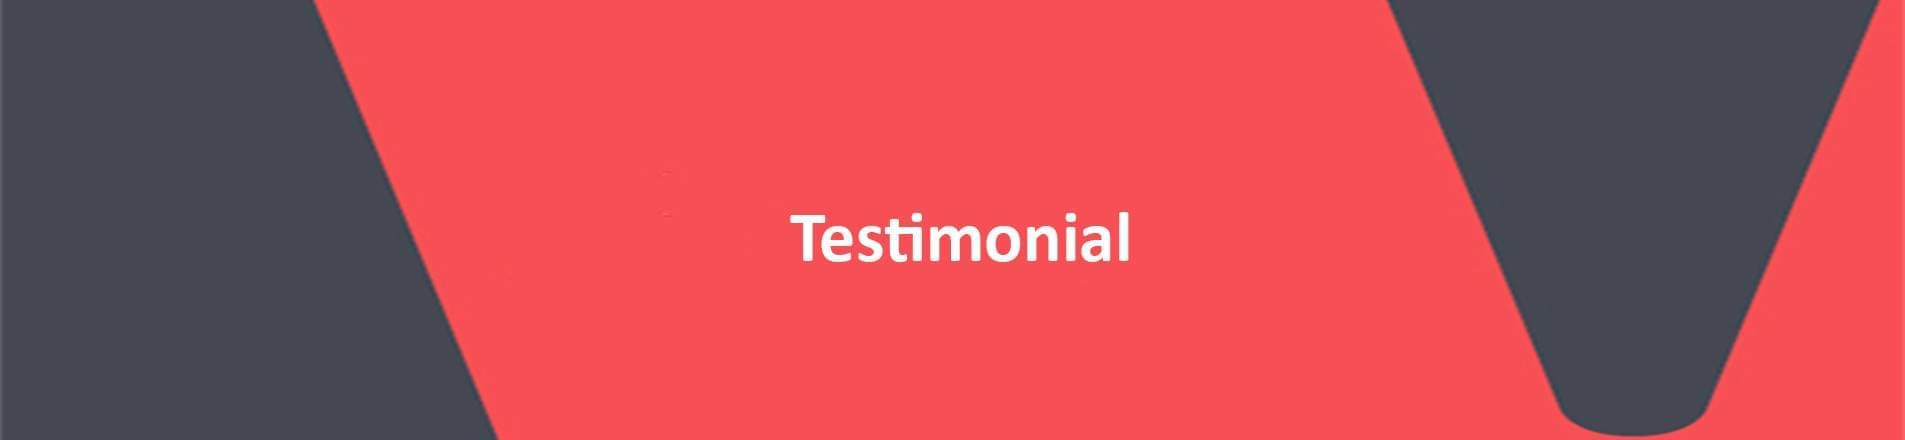 Word testimonial on VERCIDA branded background